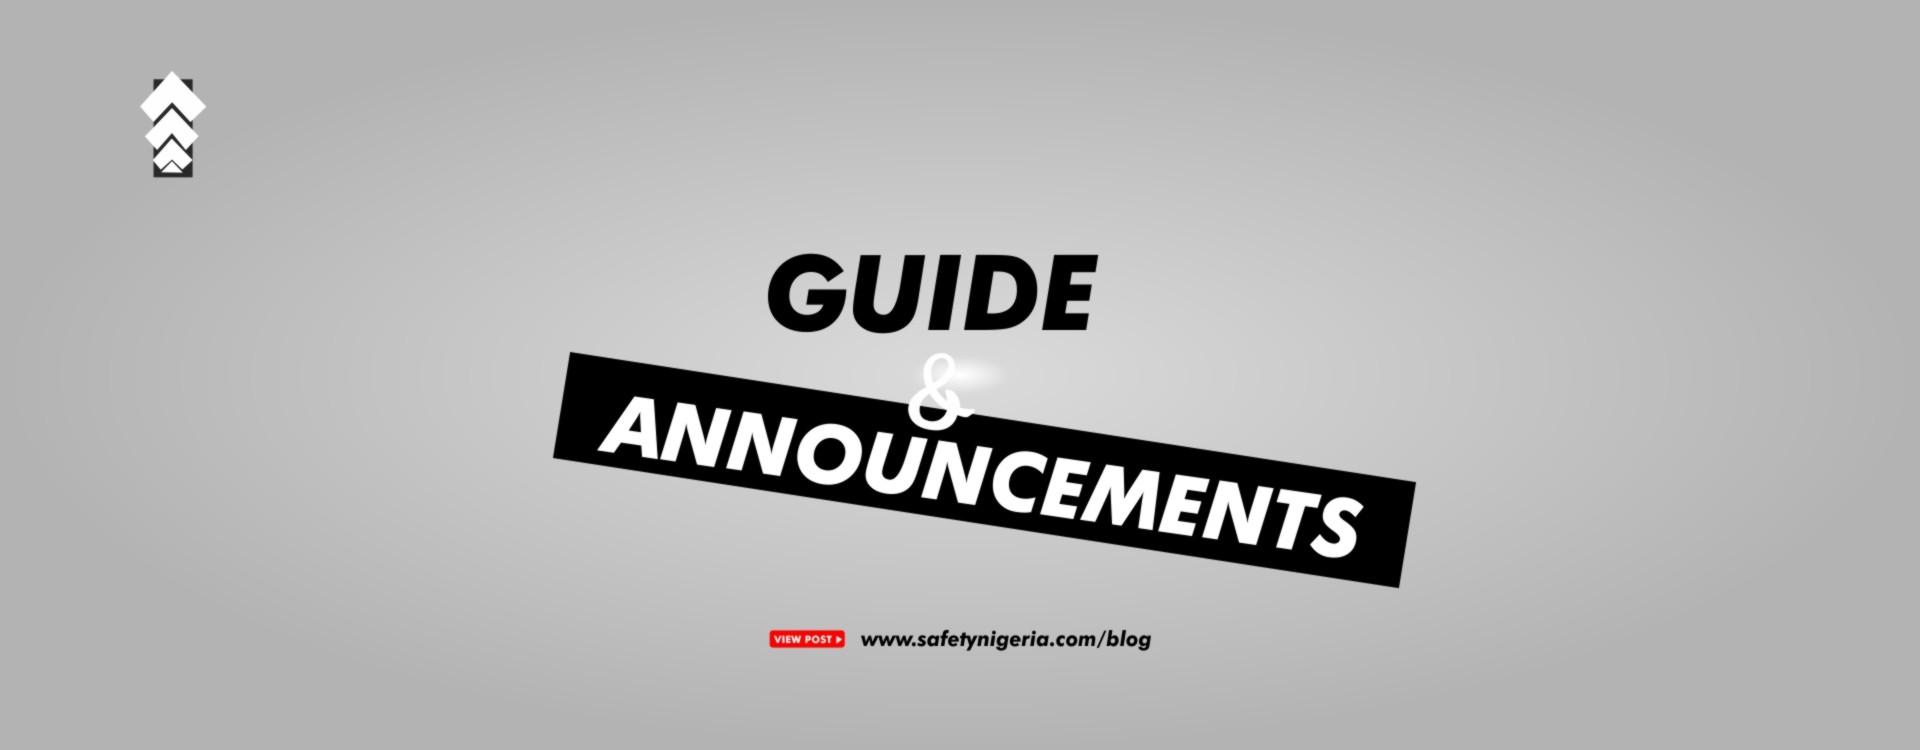 Guide/Announcement